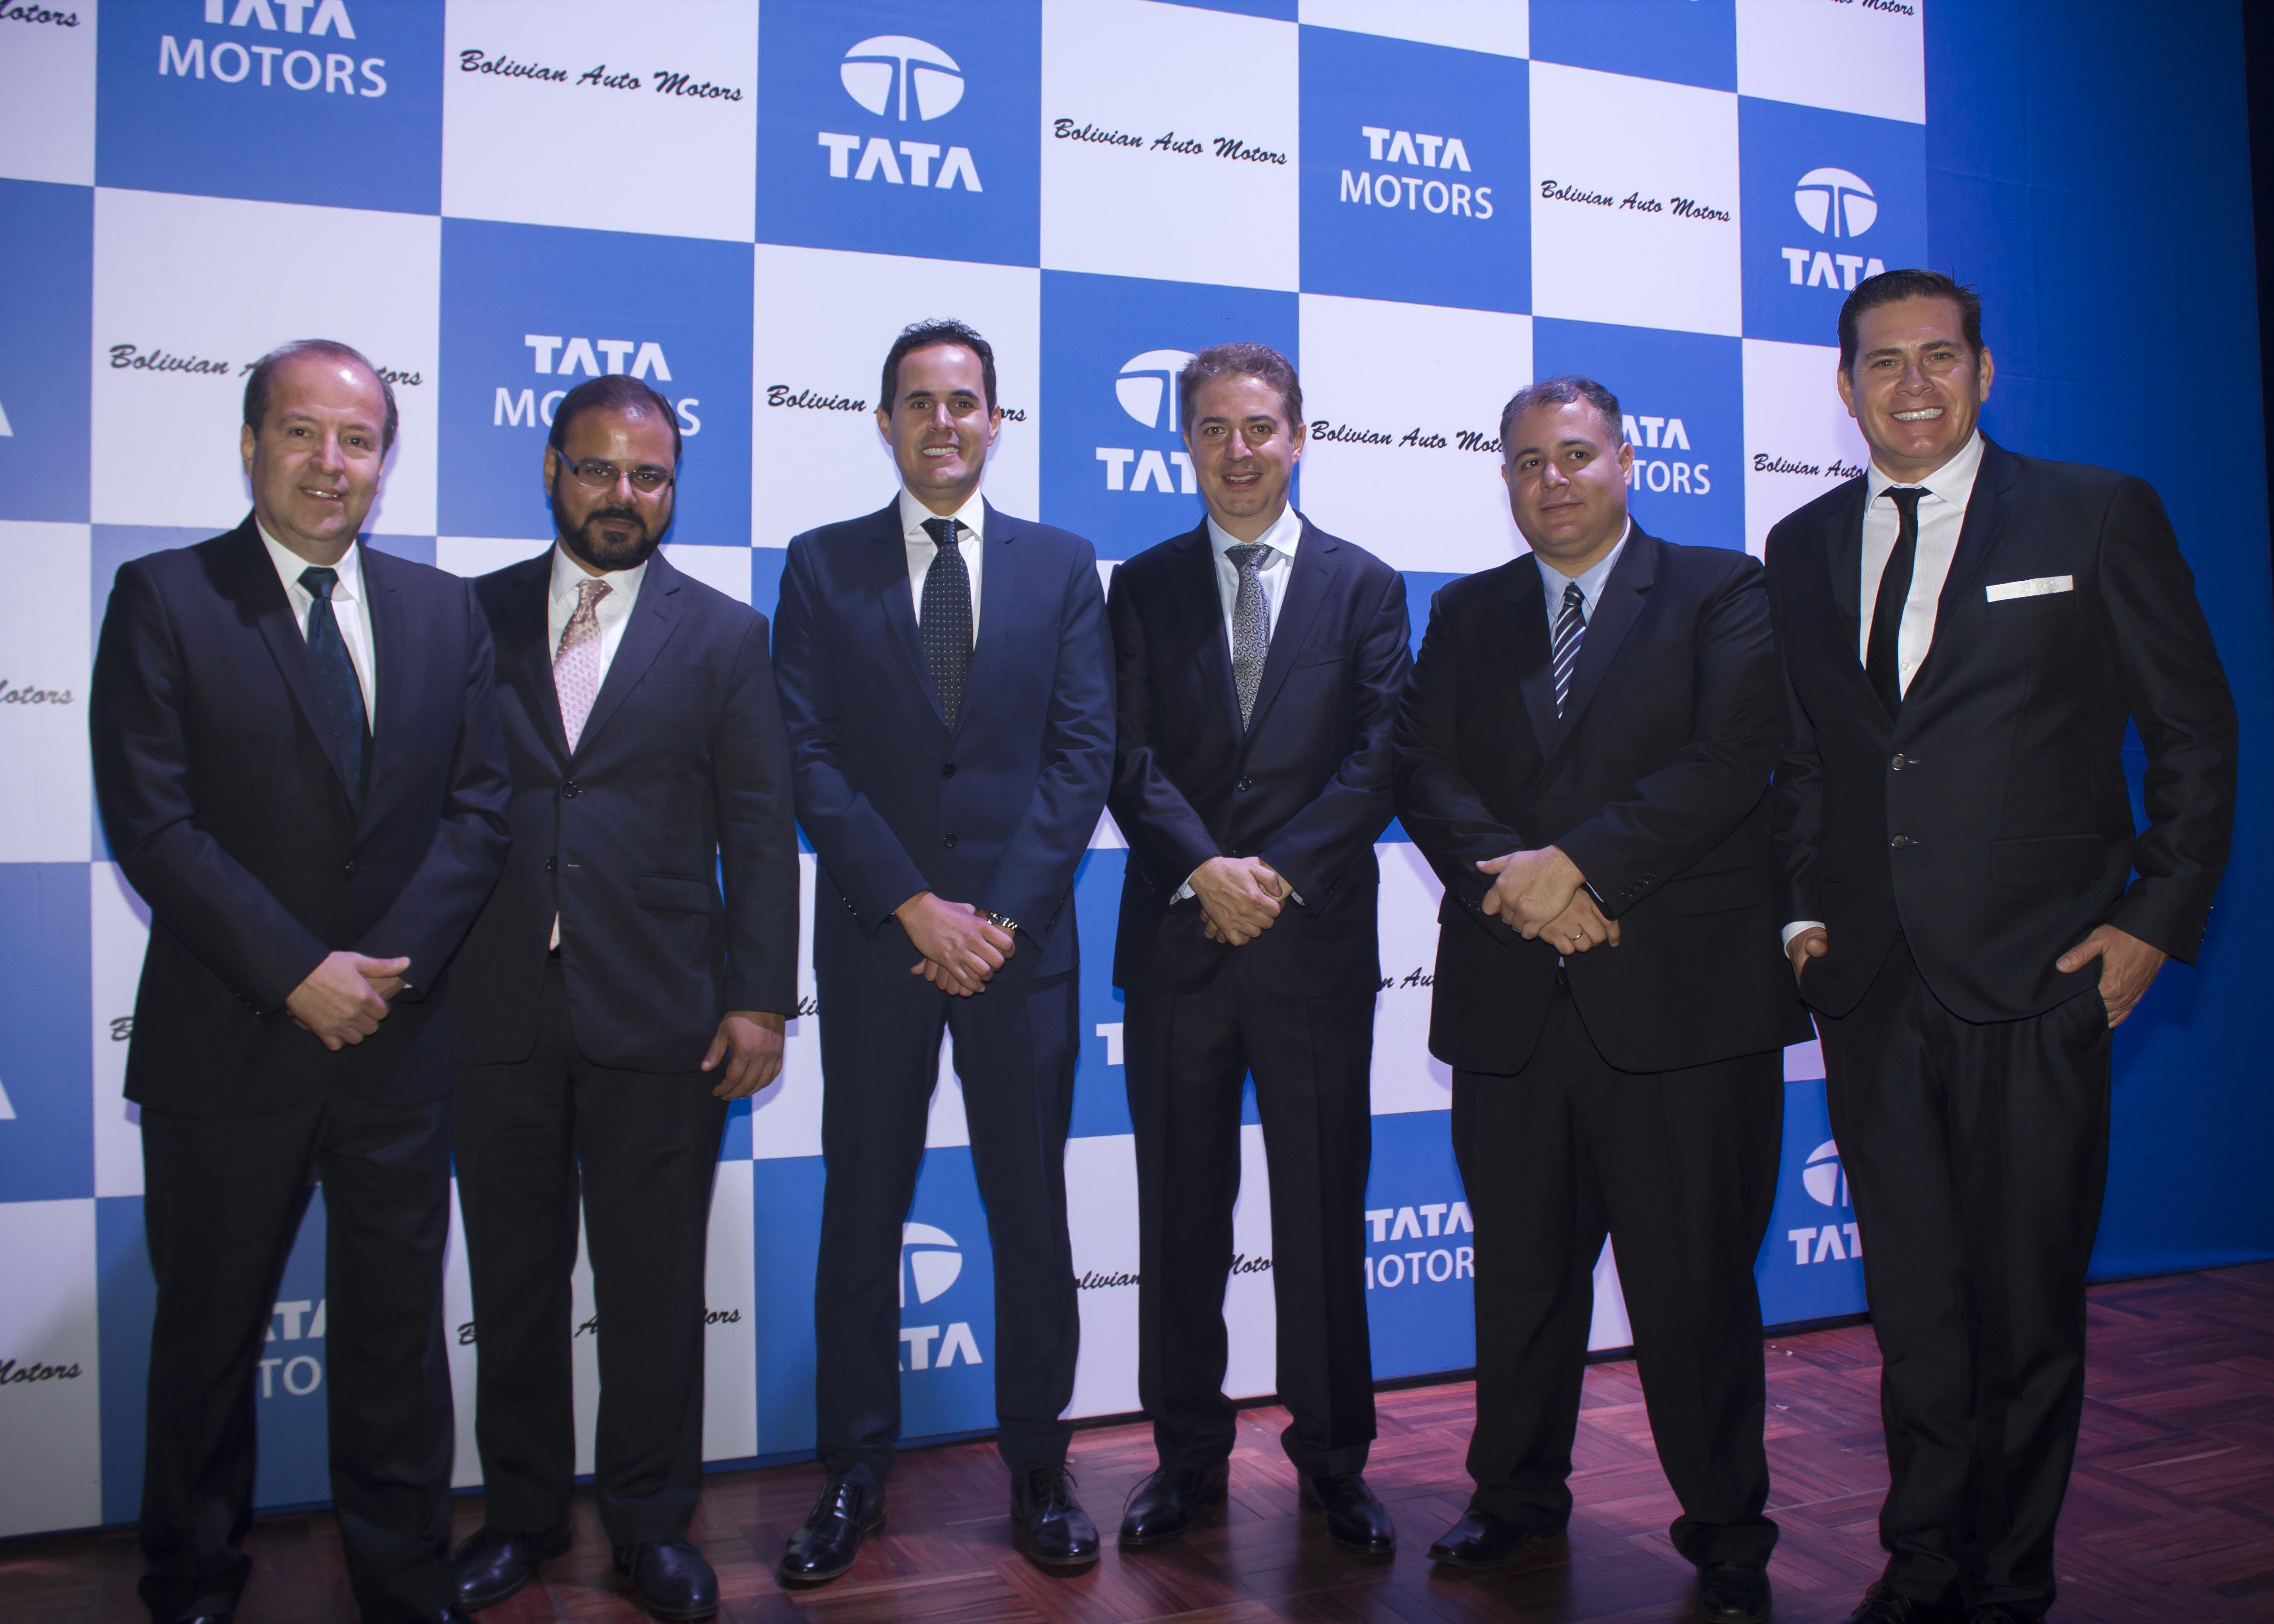 Fernando Canedo, Rudrarup Maitra, Diego Salvatierra, Federico Stelzer, Germán Moreno y Johnny Salvatierra